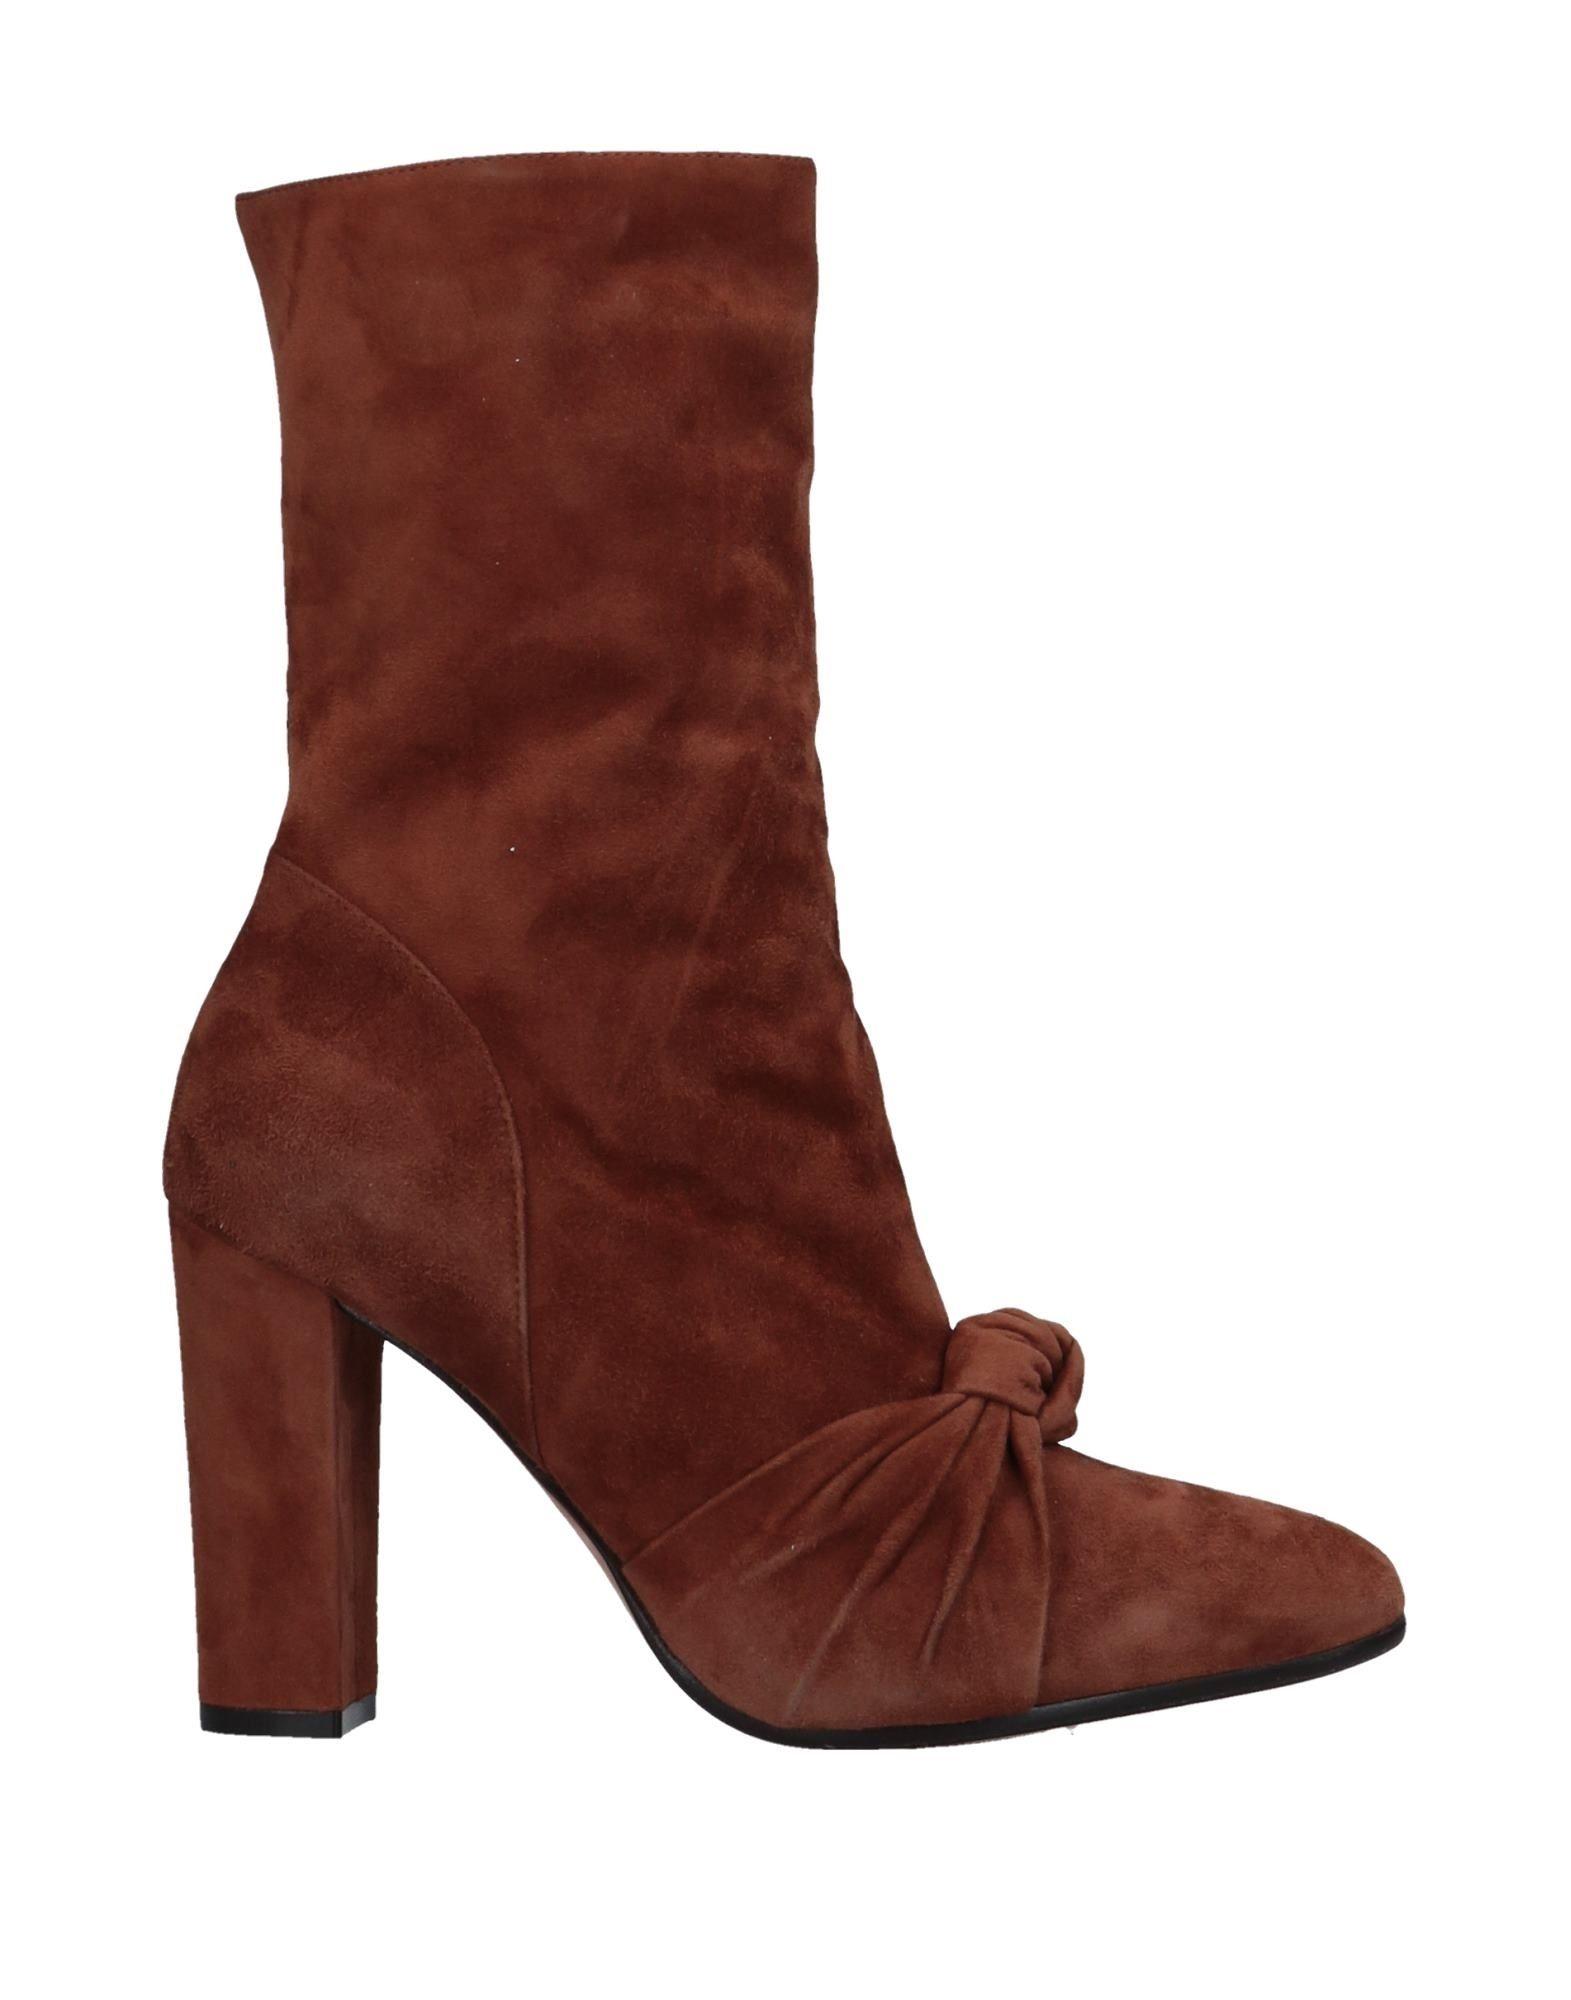 JEAN-MICHEL CAZABAT Полусапоги и высокие ботинки jean michel cazabat ботинки